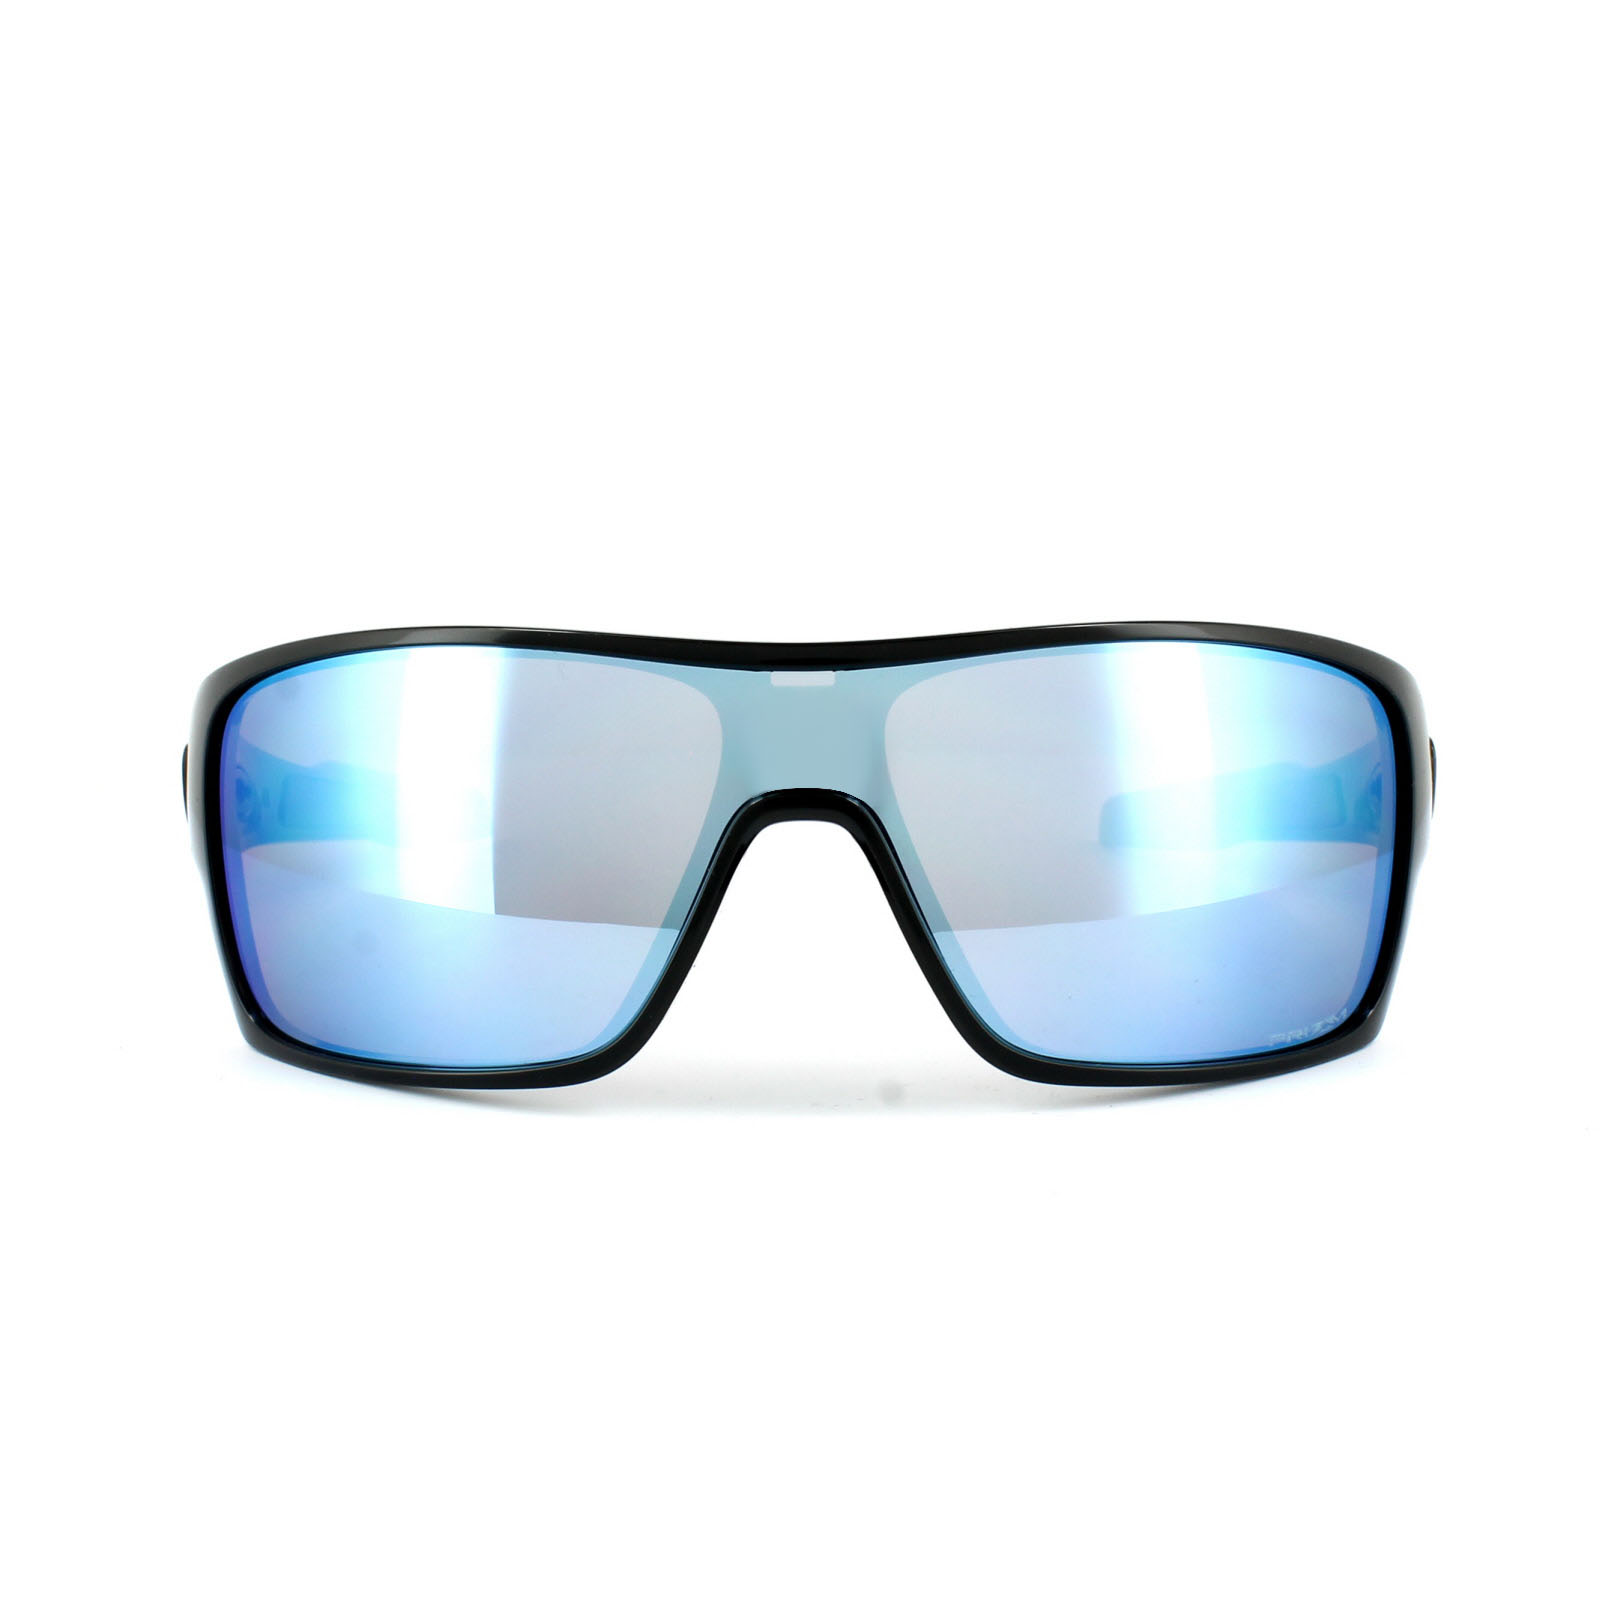 8d088df2e8 Sentinel Oakley Sunglasses Turbine Rotor OO9307-08 Shiny Black Prizm Salt  Water Polarized